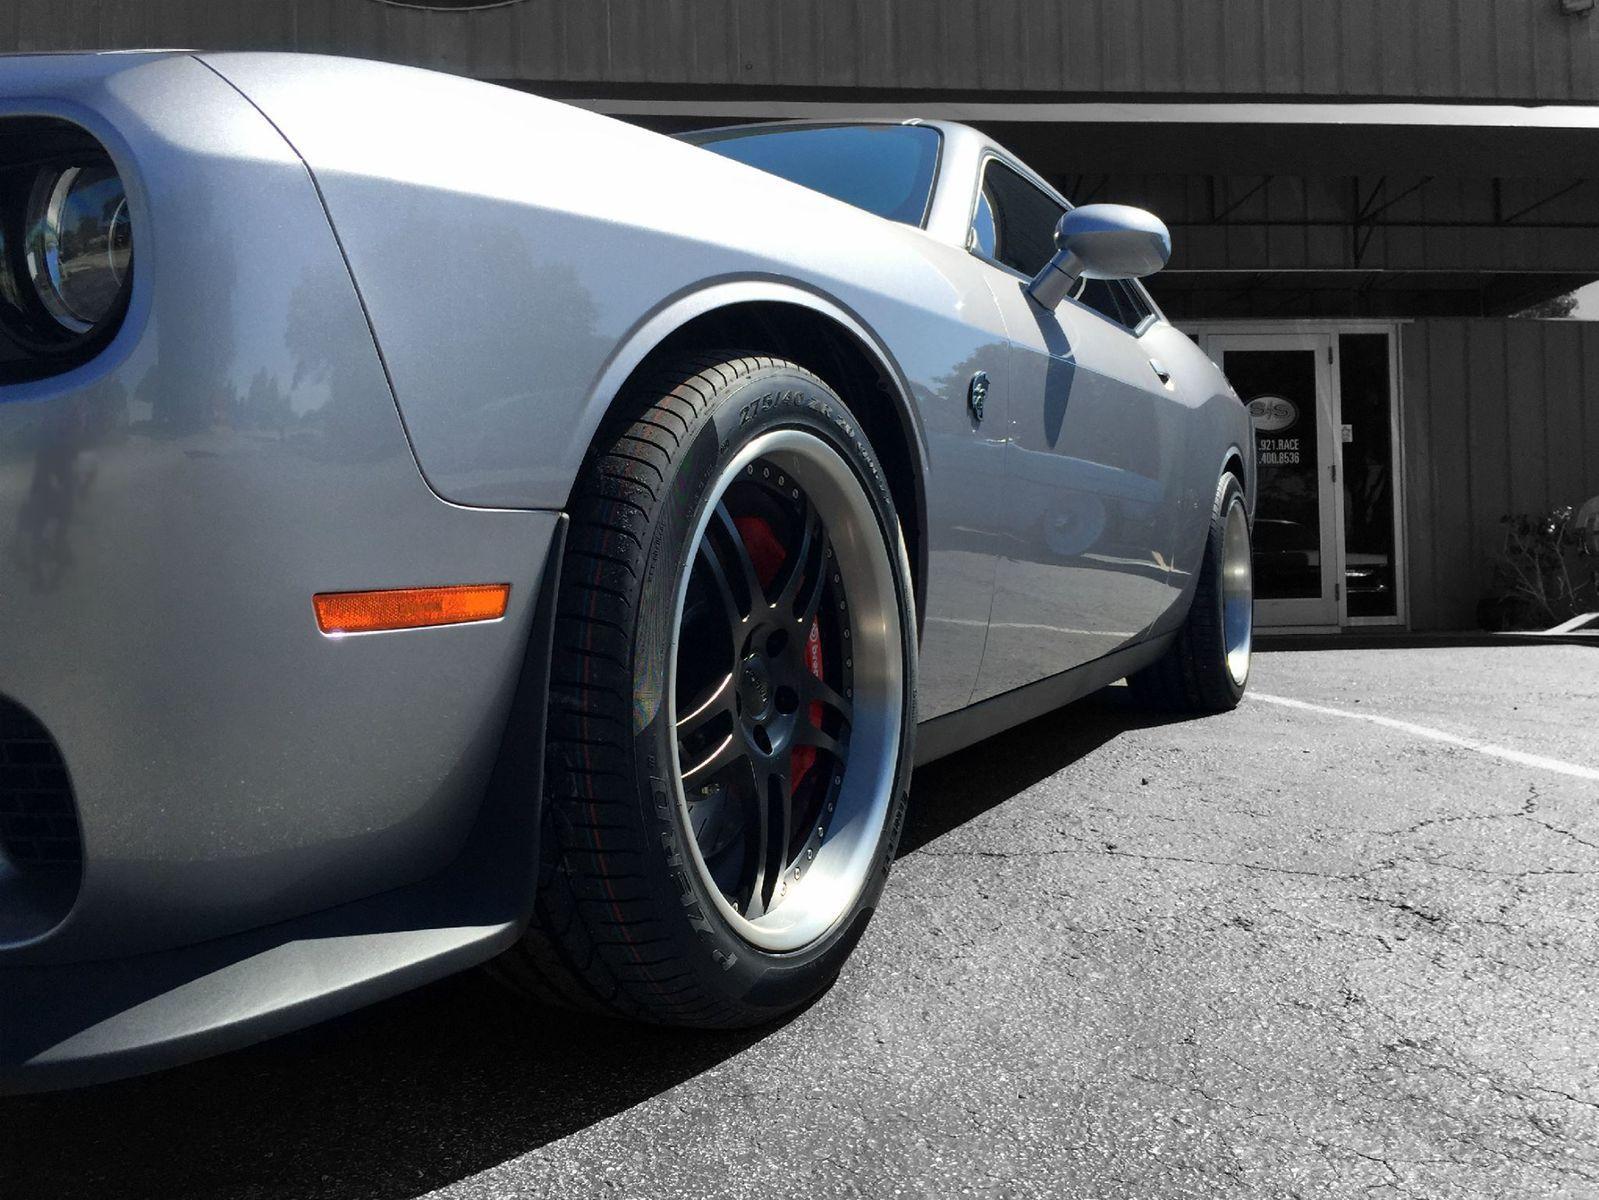 2015 Dodge Challenger | Challenger SRT Hellcat on Forgeline DS3P Wheels